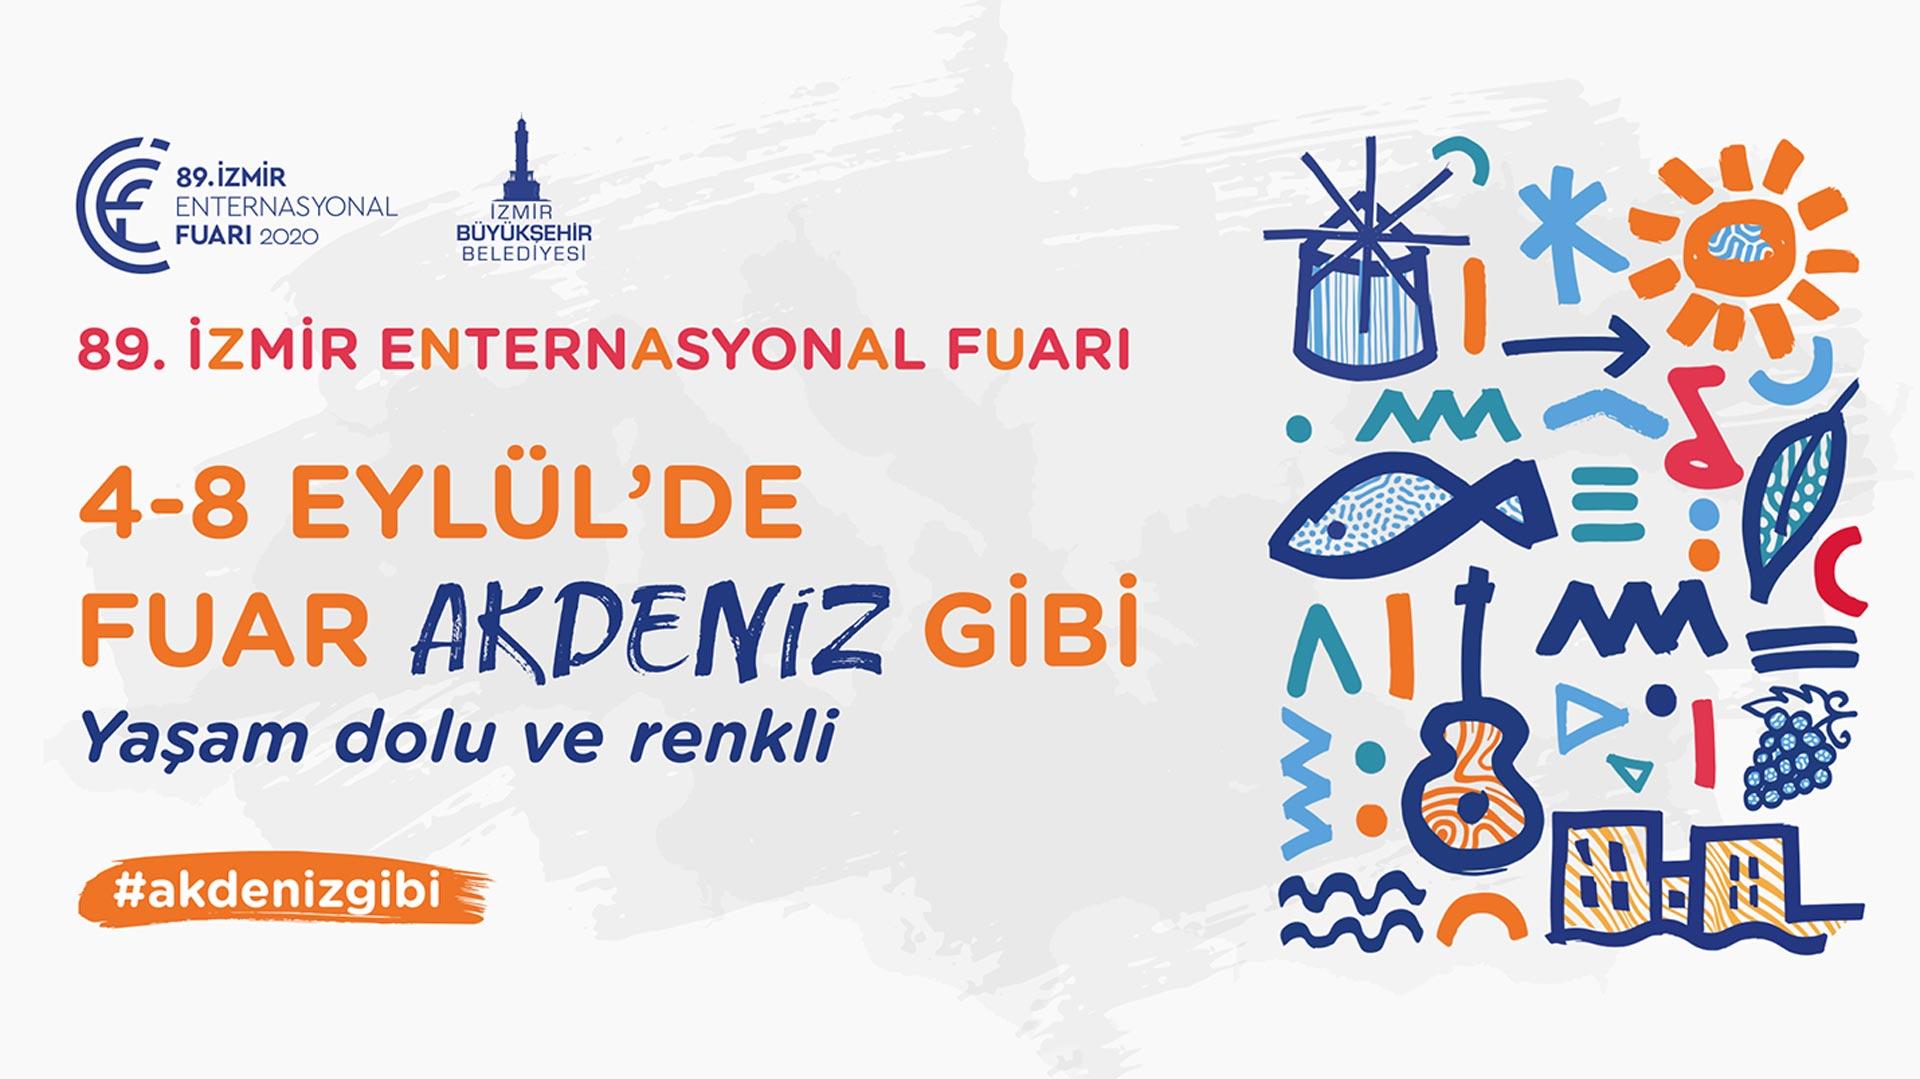 89 Izmir Enternasyonal Fuari